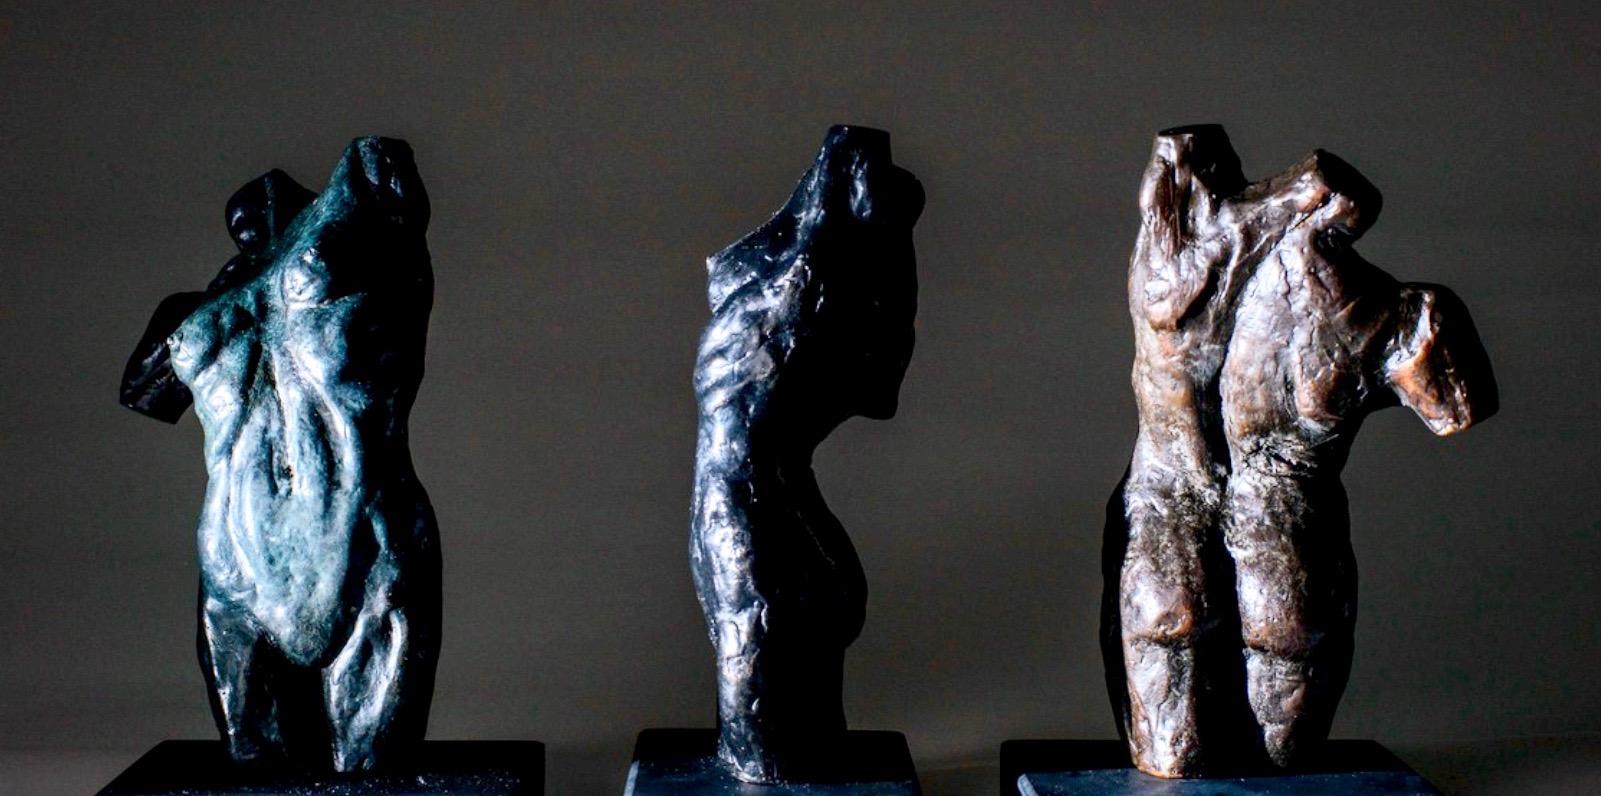 bronze sculpture artworks